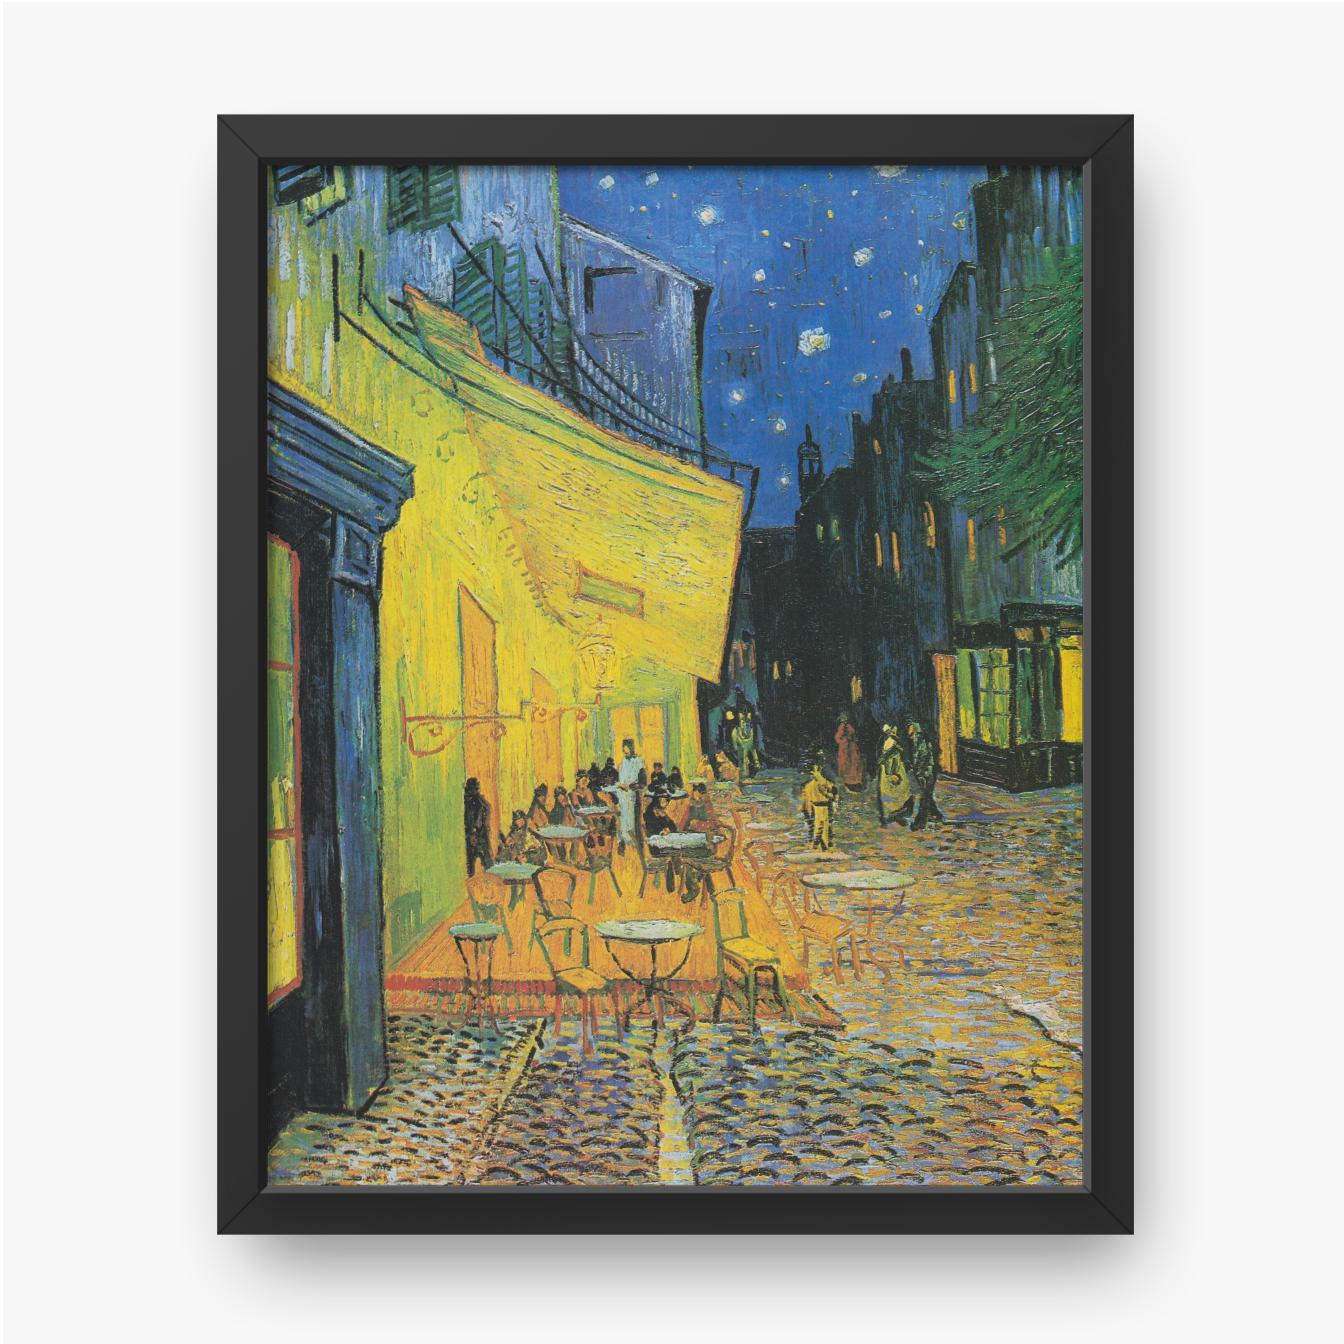 Vincent van Gogh, Taras kawiarni w nocy, 1888